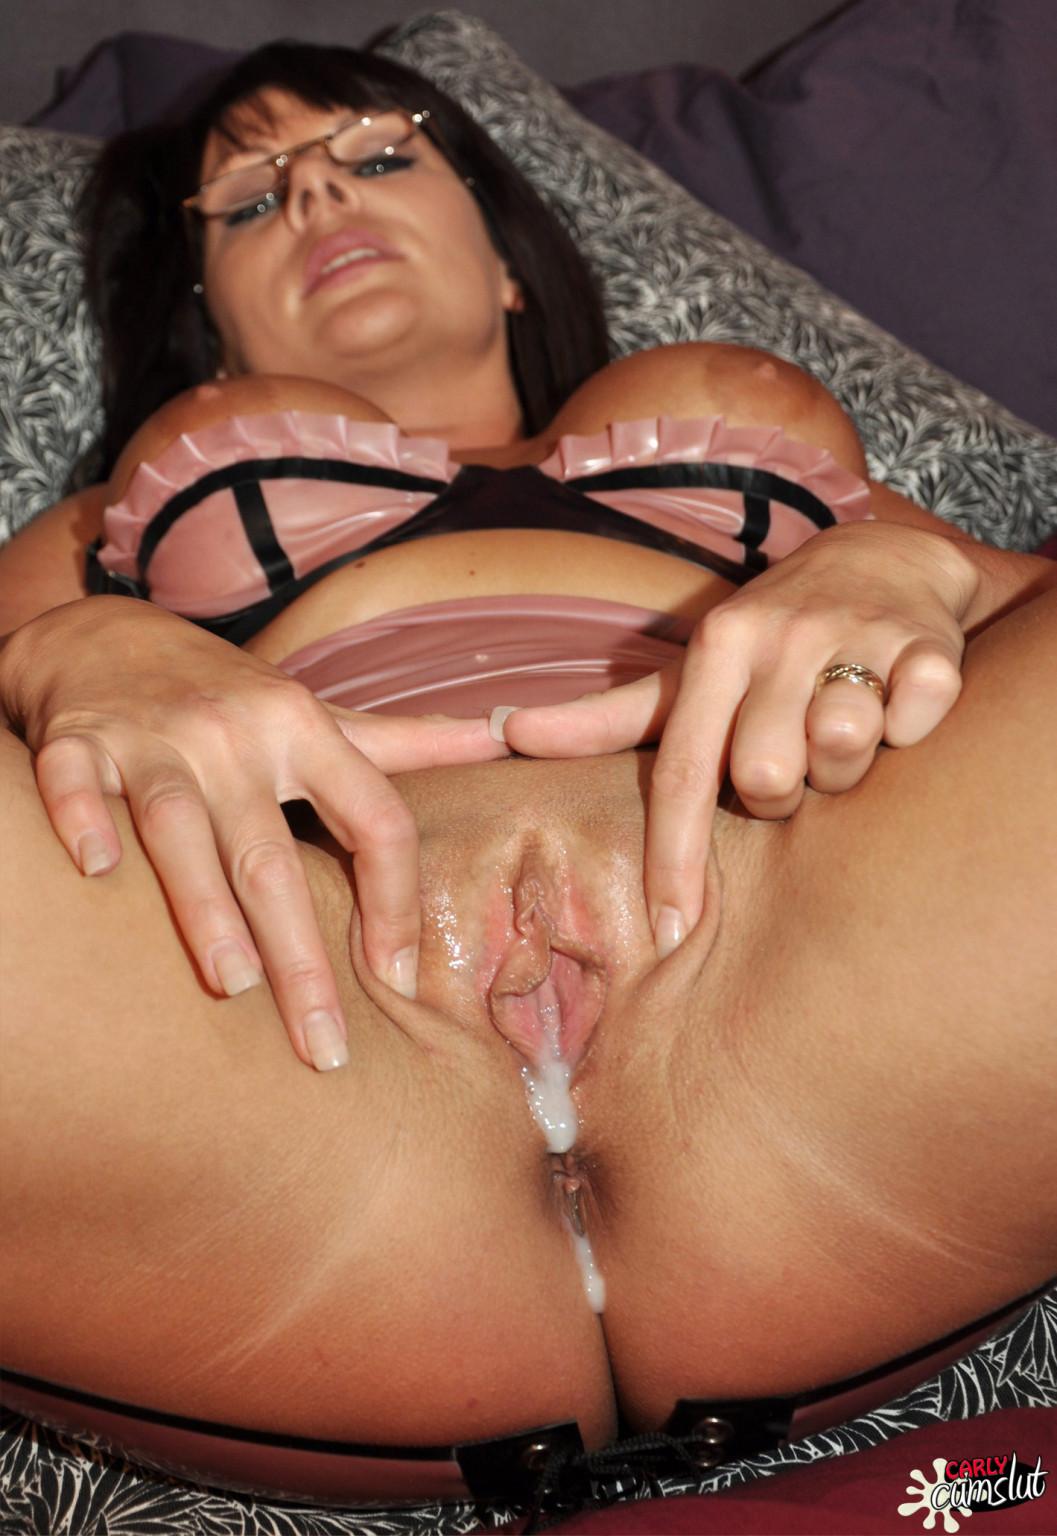 Sex Mature Cumshot Carly Cum Slut